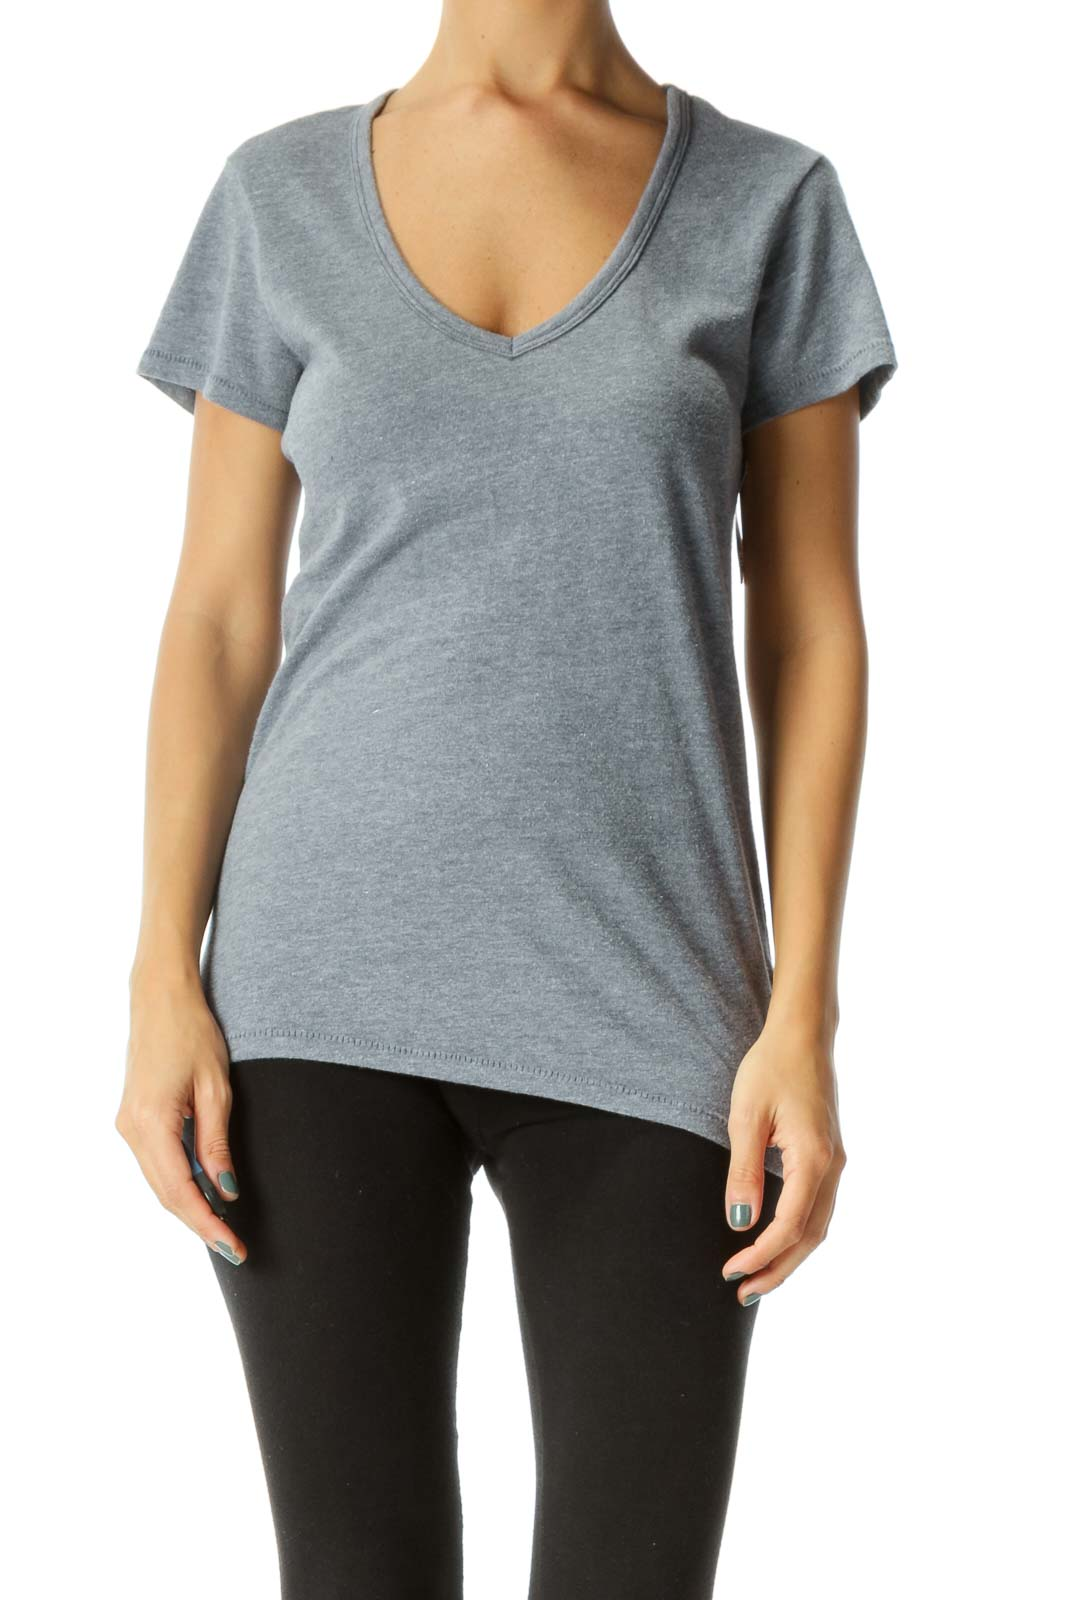 Gray Blue V-Neck Soft T-Shirt Front